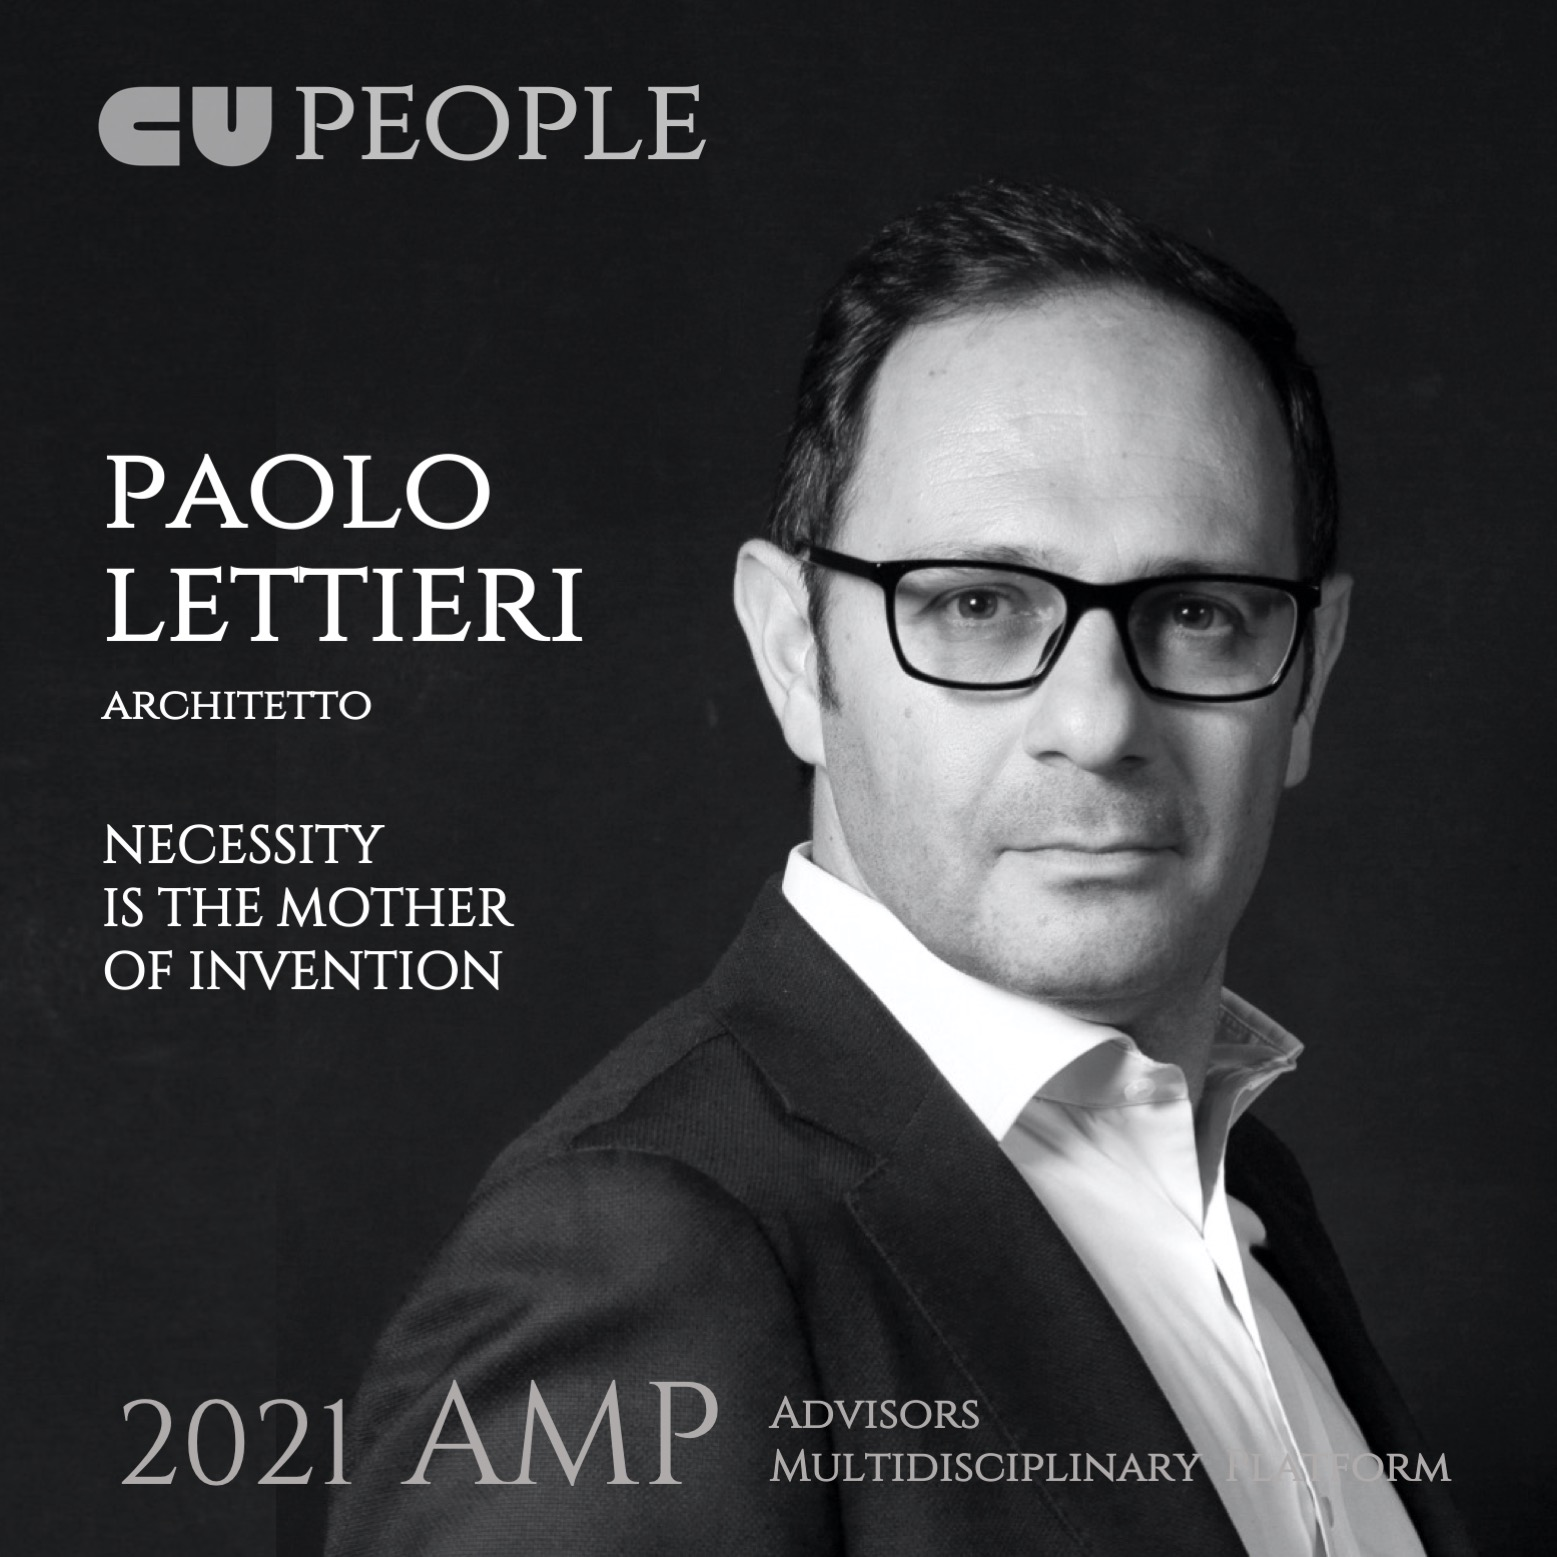 CU PEOPLE Advisors Multidisciplinary Platform_ PAOLO LETTIERI Architetto